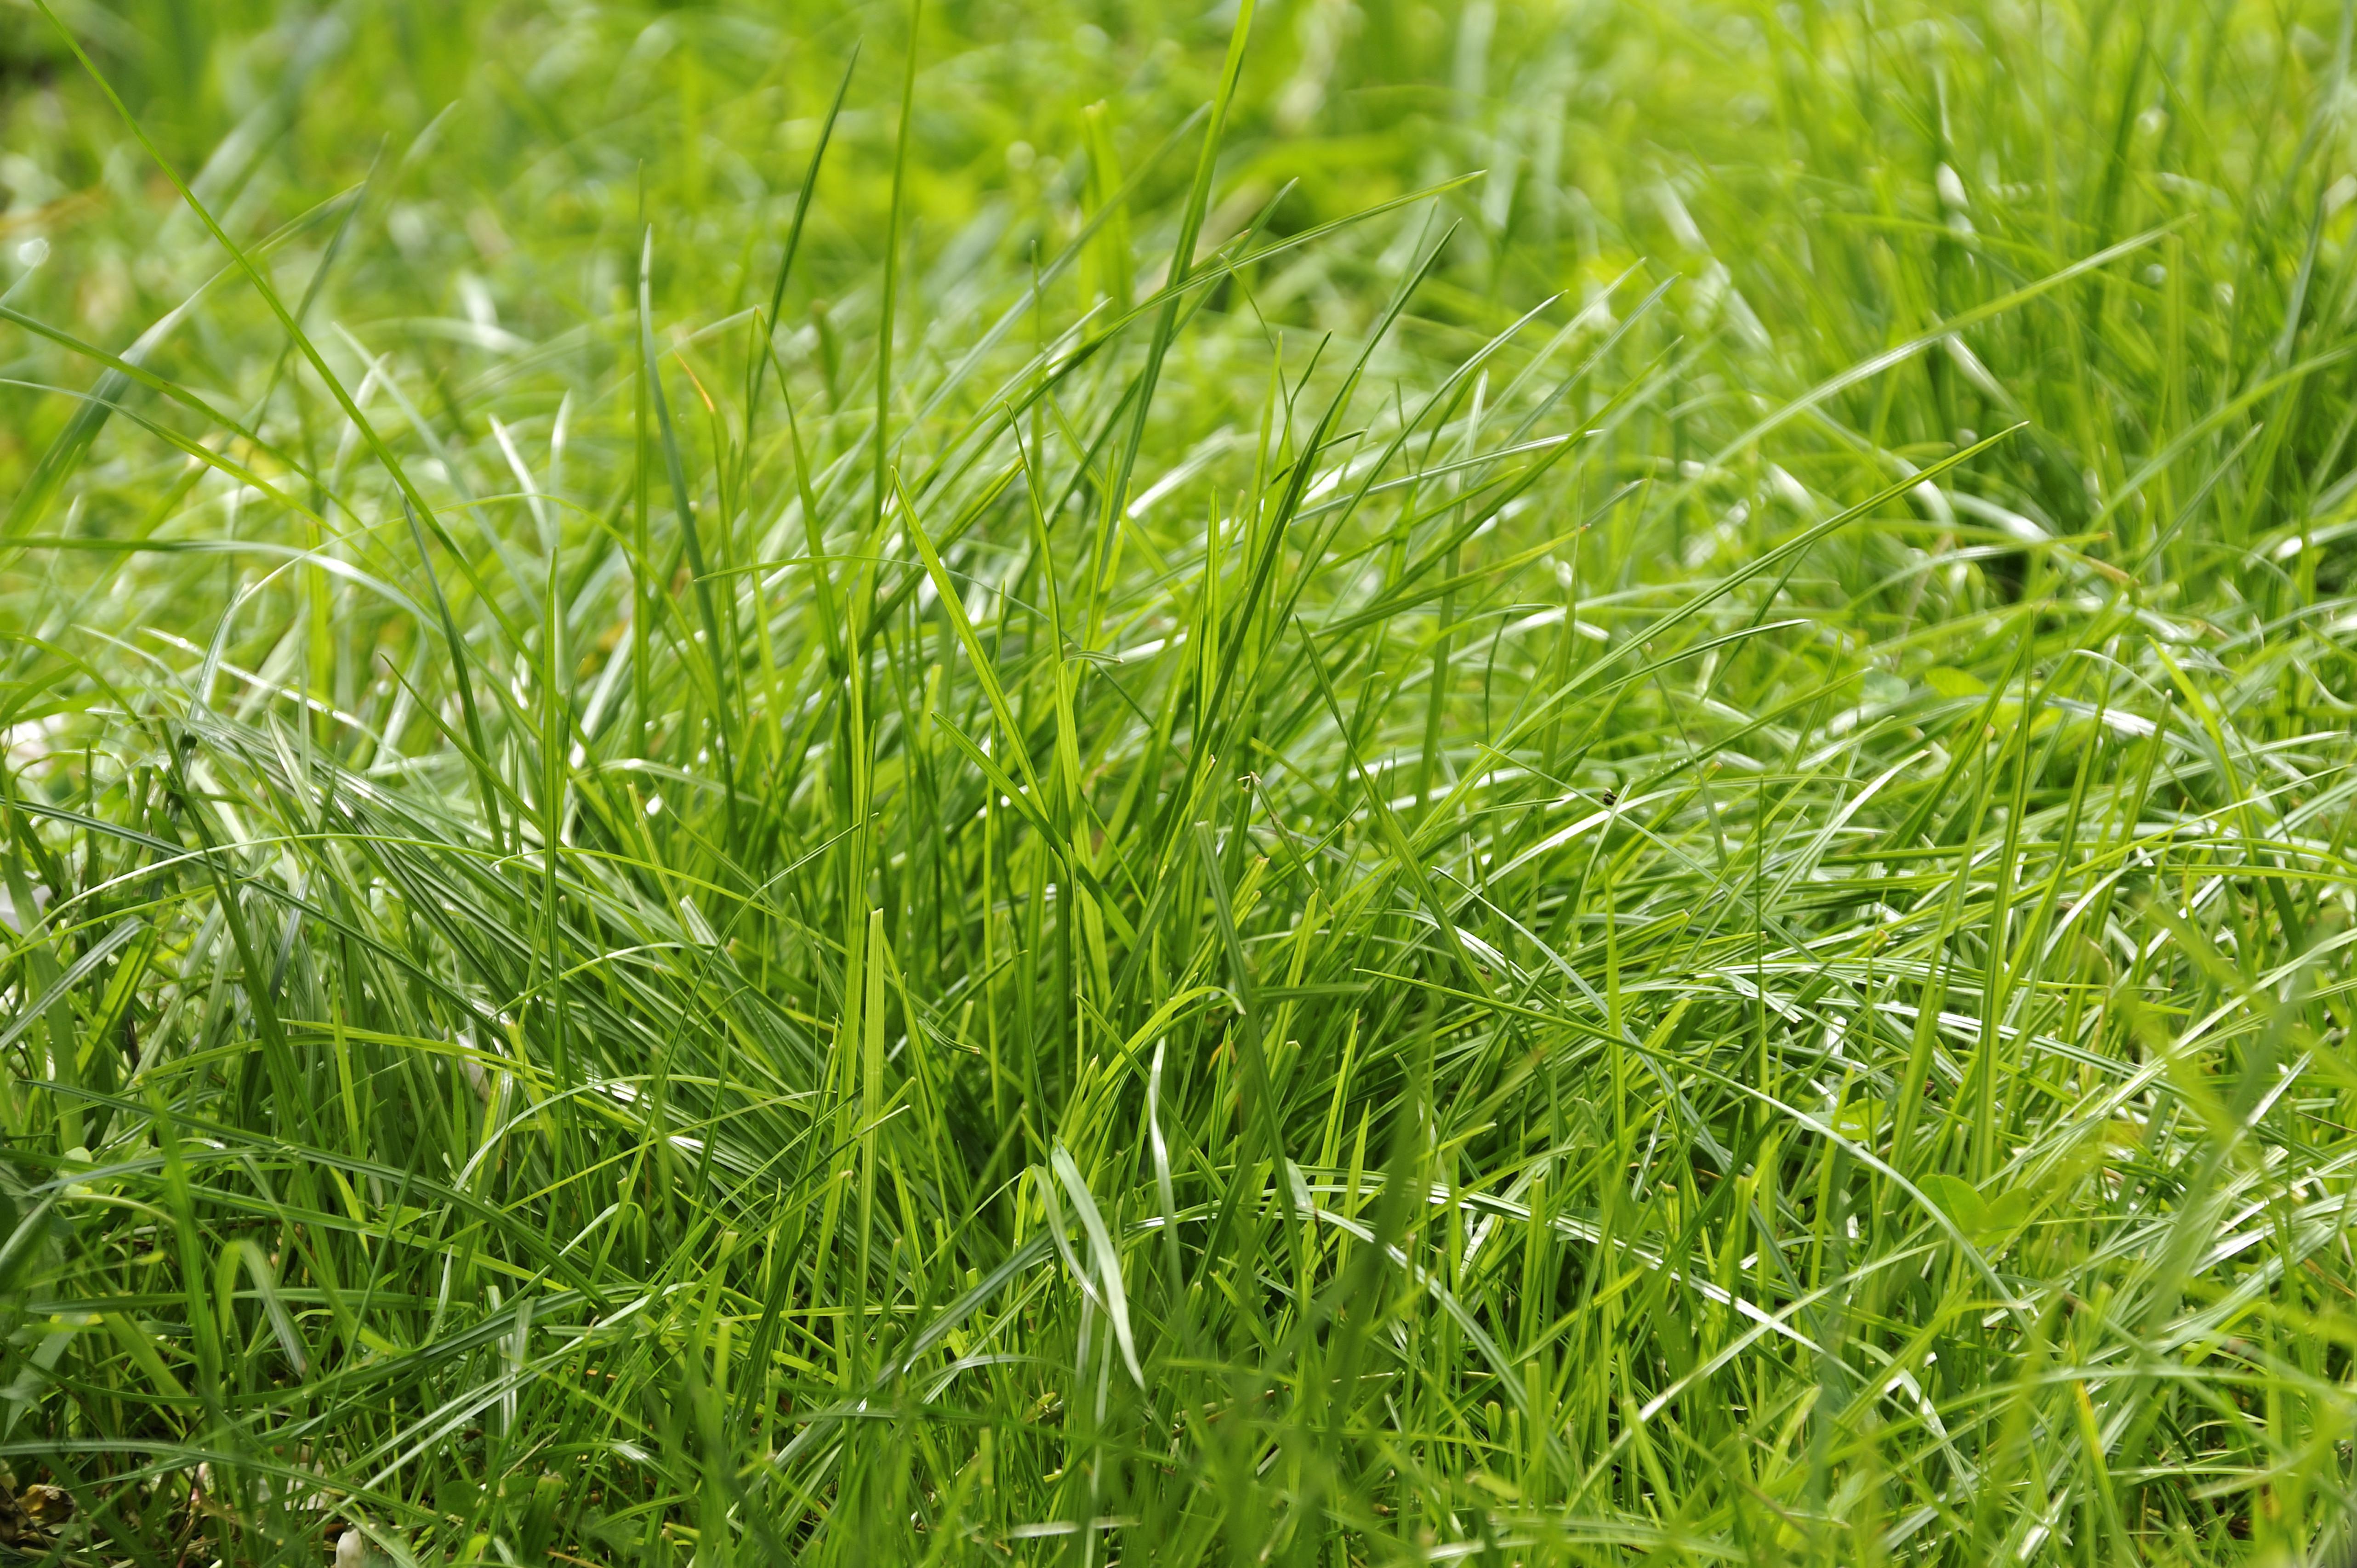 Briznas de hierba, festuca roja o hierba festuca roja rastrera (Festuca rubra), Freiamt, Selva Negra, Baden-Wuerttemberg, Alemania